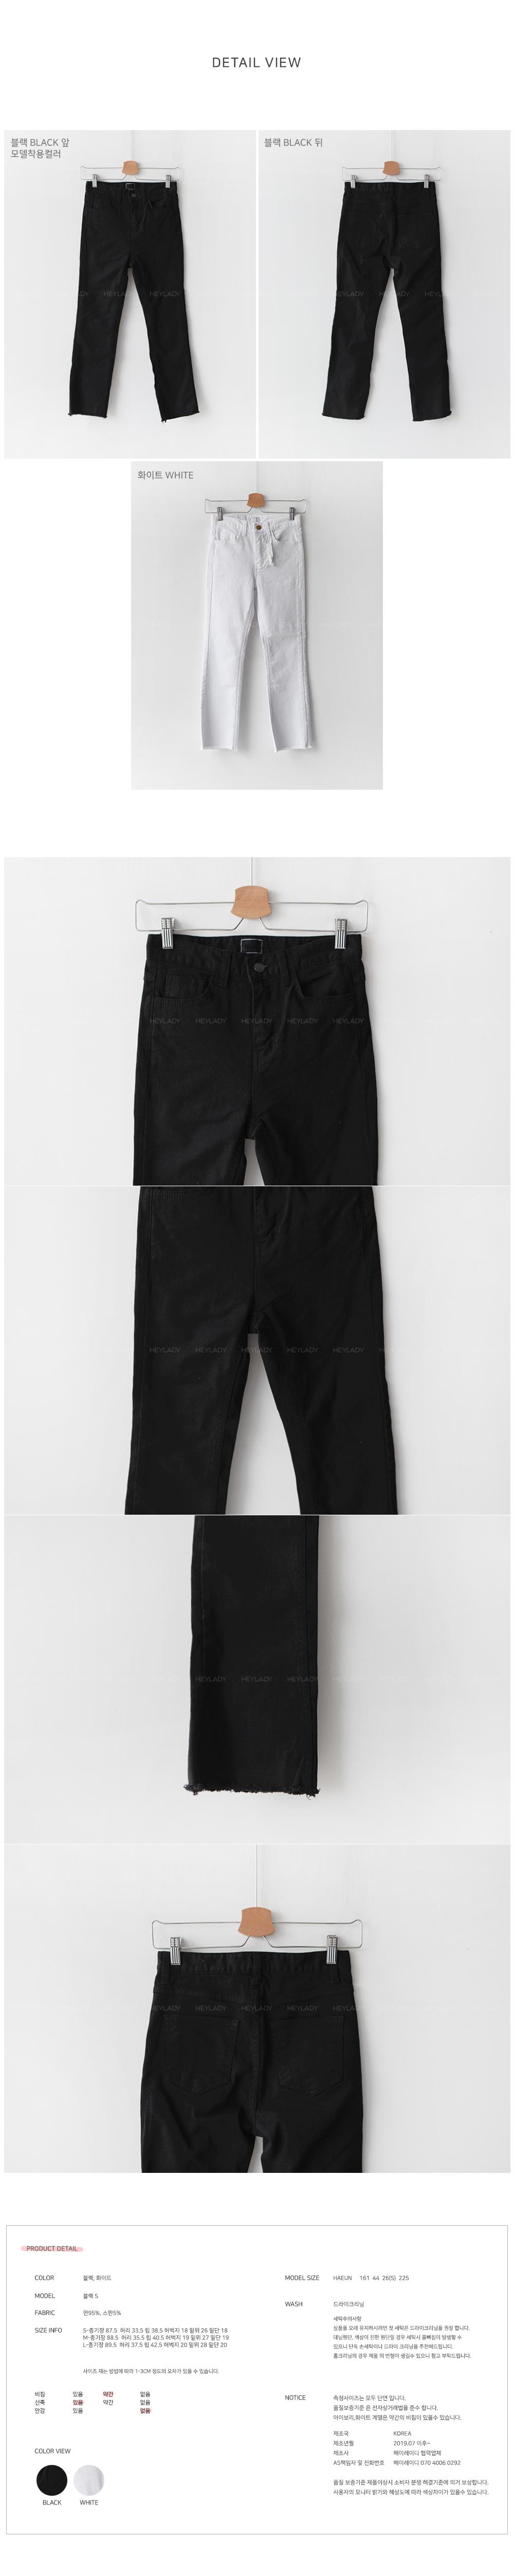 Beer bootcut cotton pants